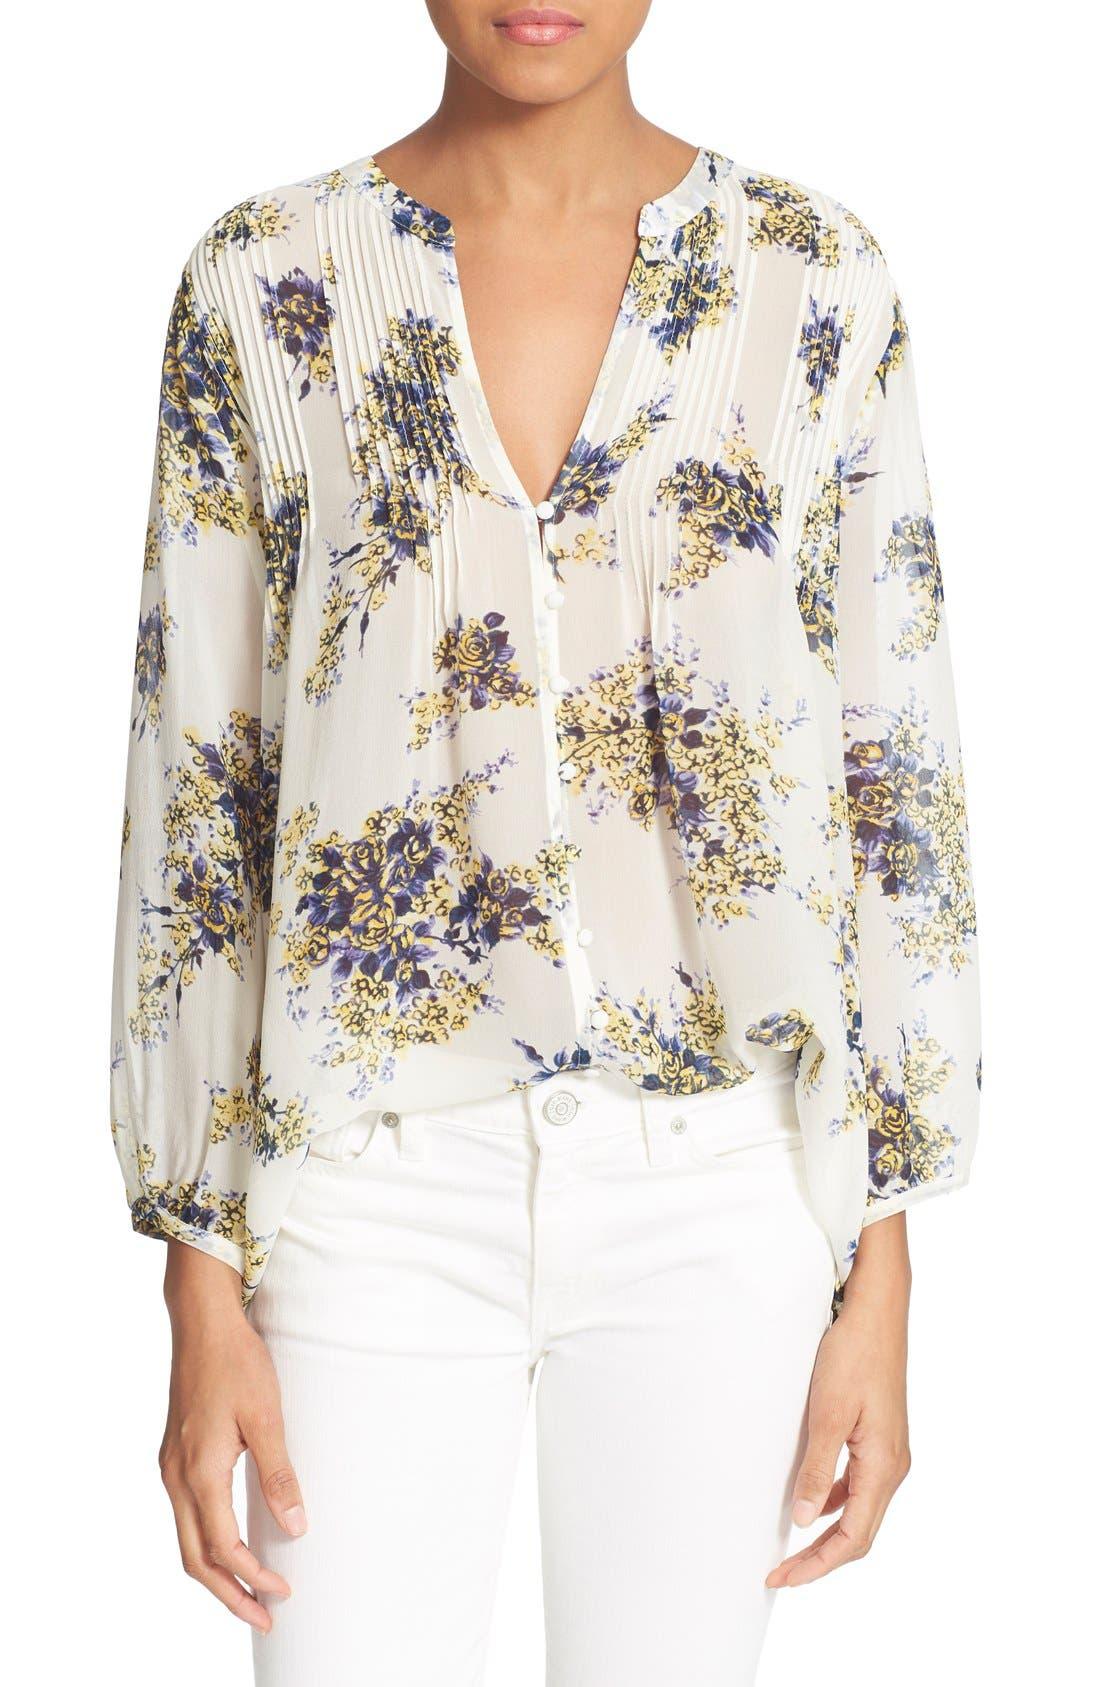 Alternate Image 1 Selected - Joie 'Laurel B' Floral Print Silk Top